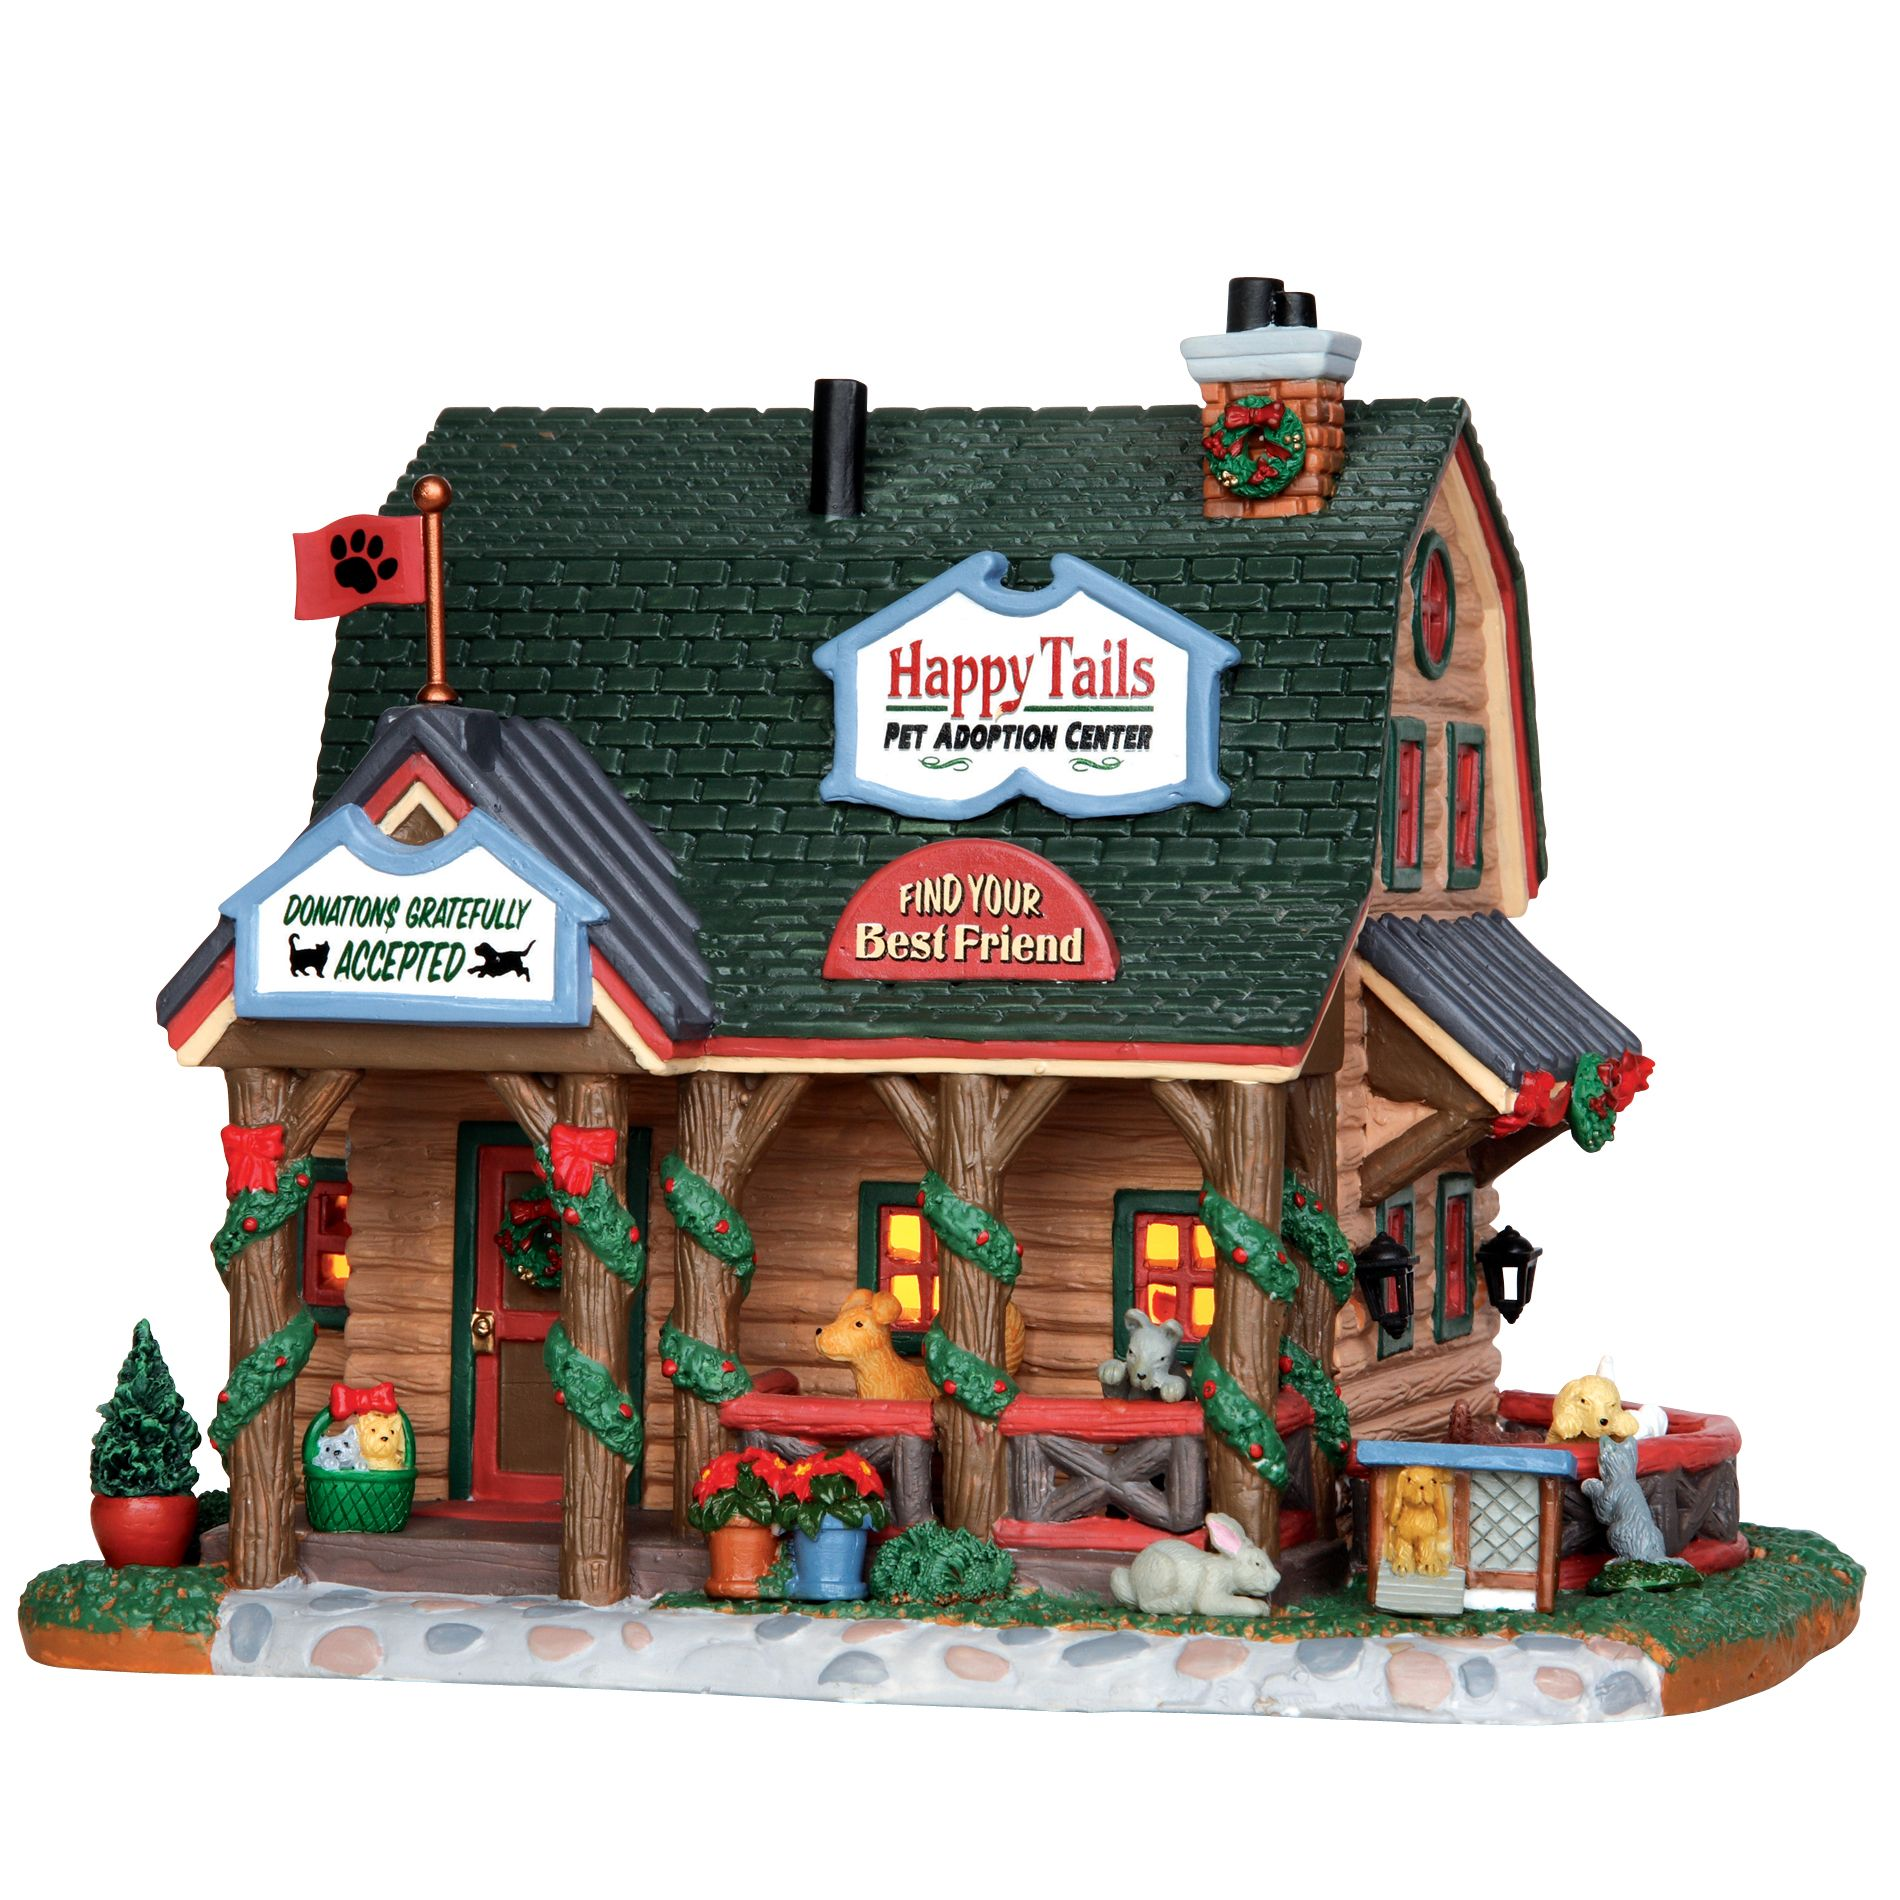 Lemax Village Collection Christmas Village Building Happy